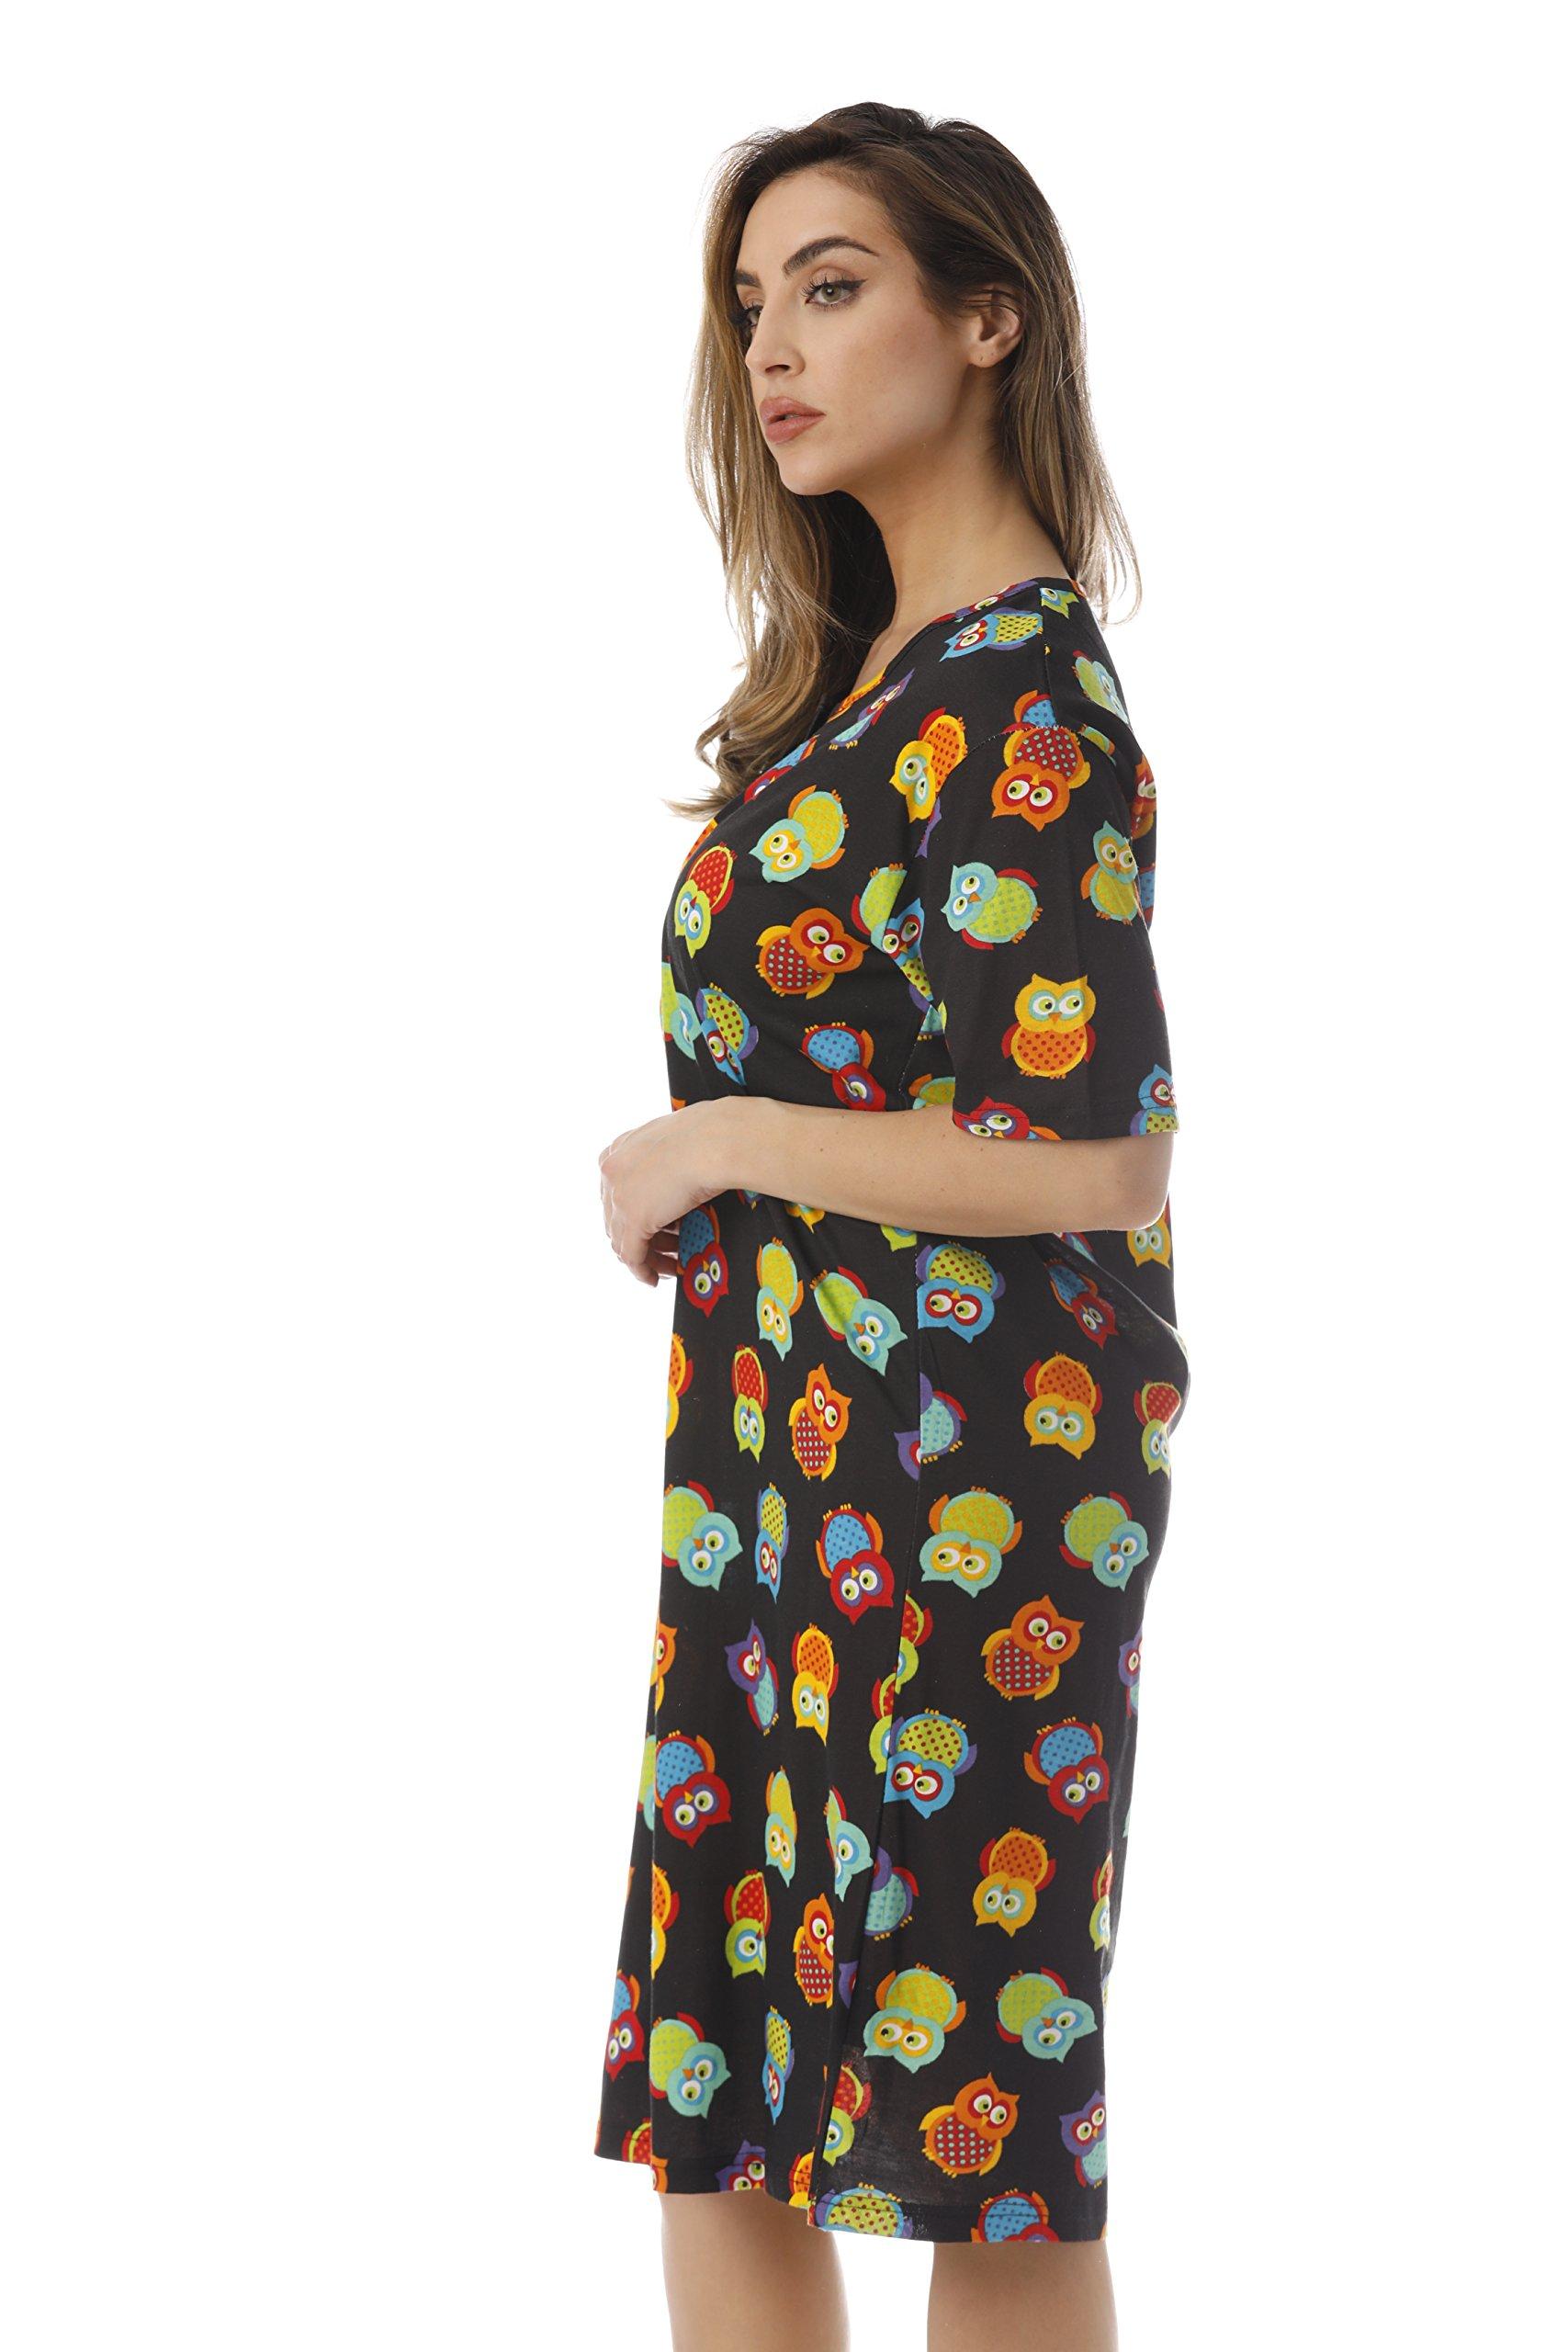 Just Love Short Sleeve Nightgown Sleep Dress for Women Sleepwear 4360-10292-3X by Just Love (Image #2)